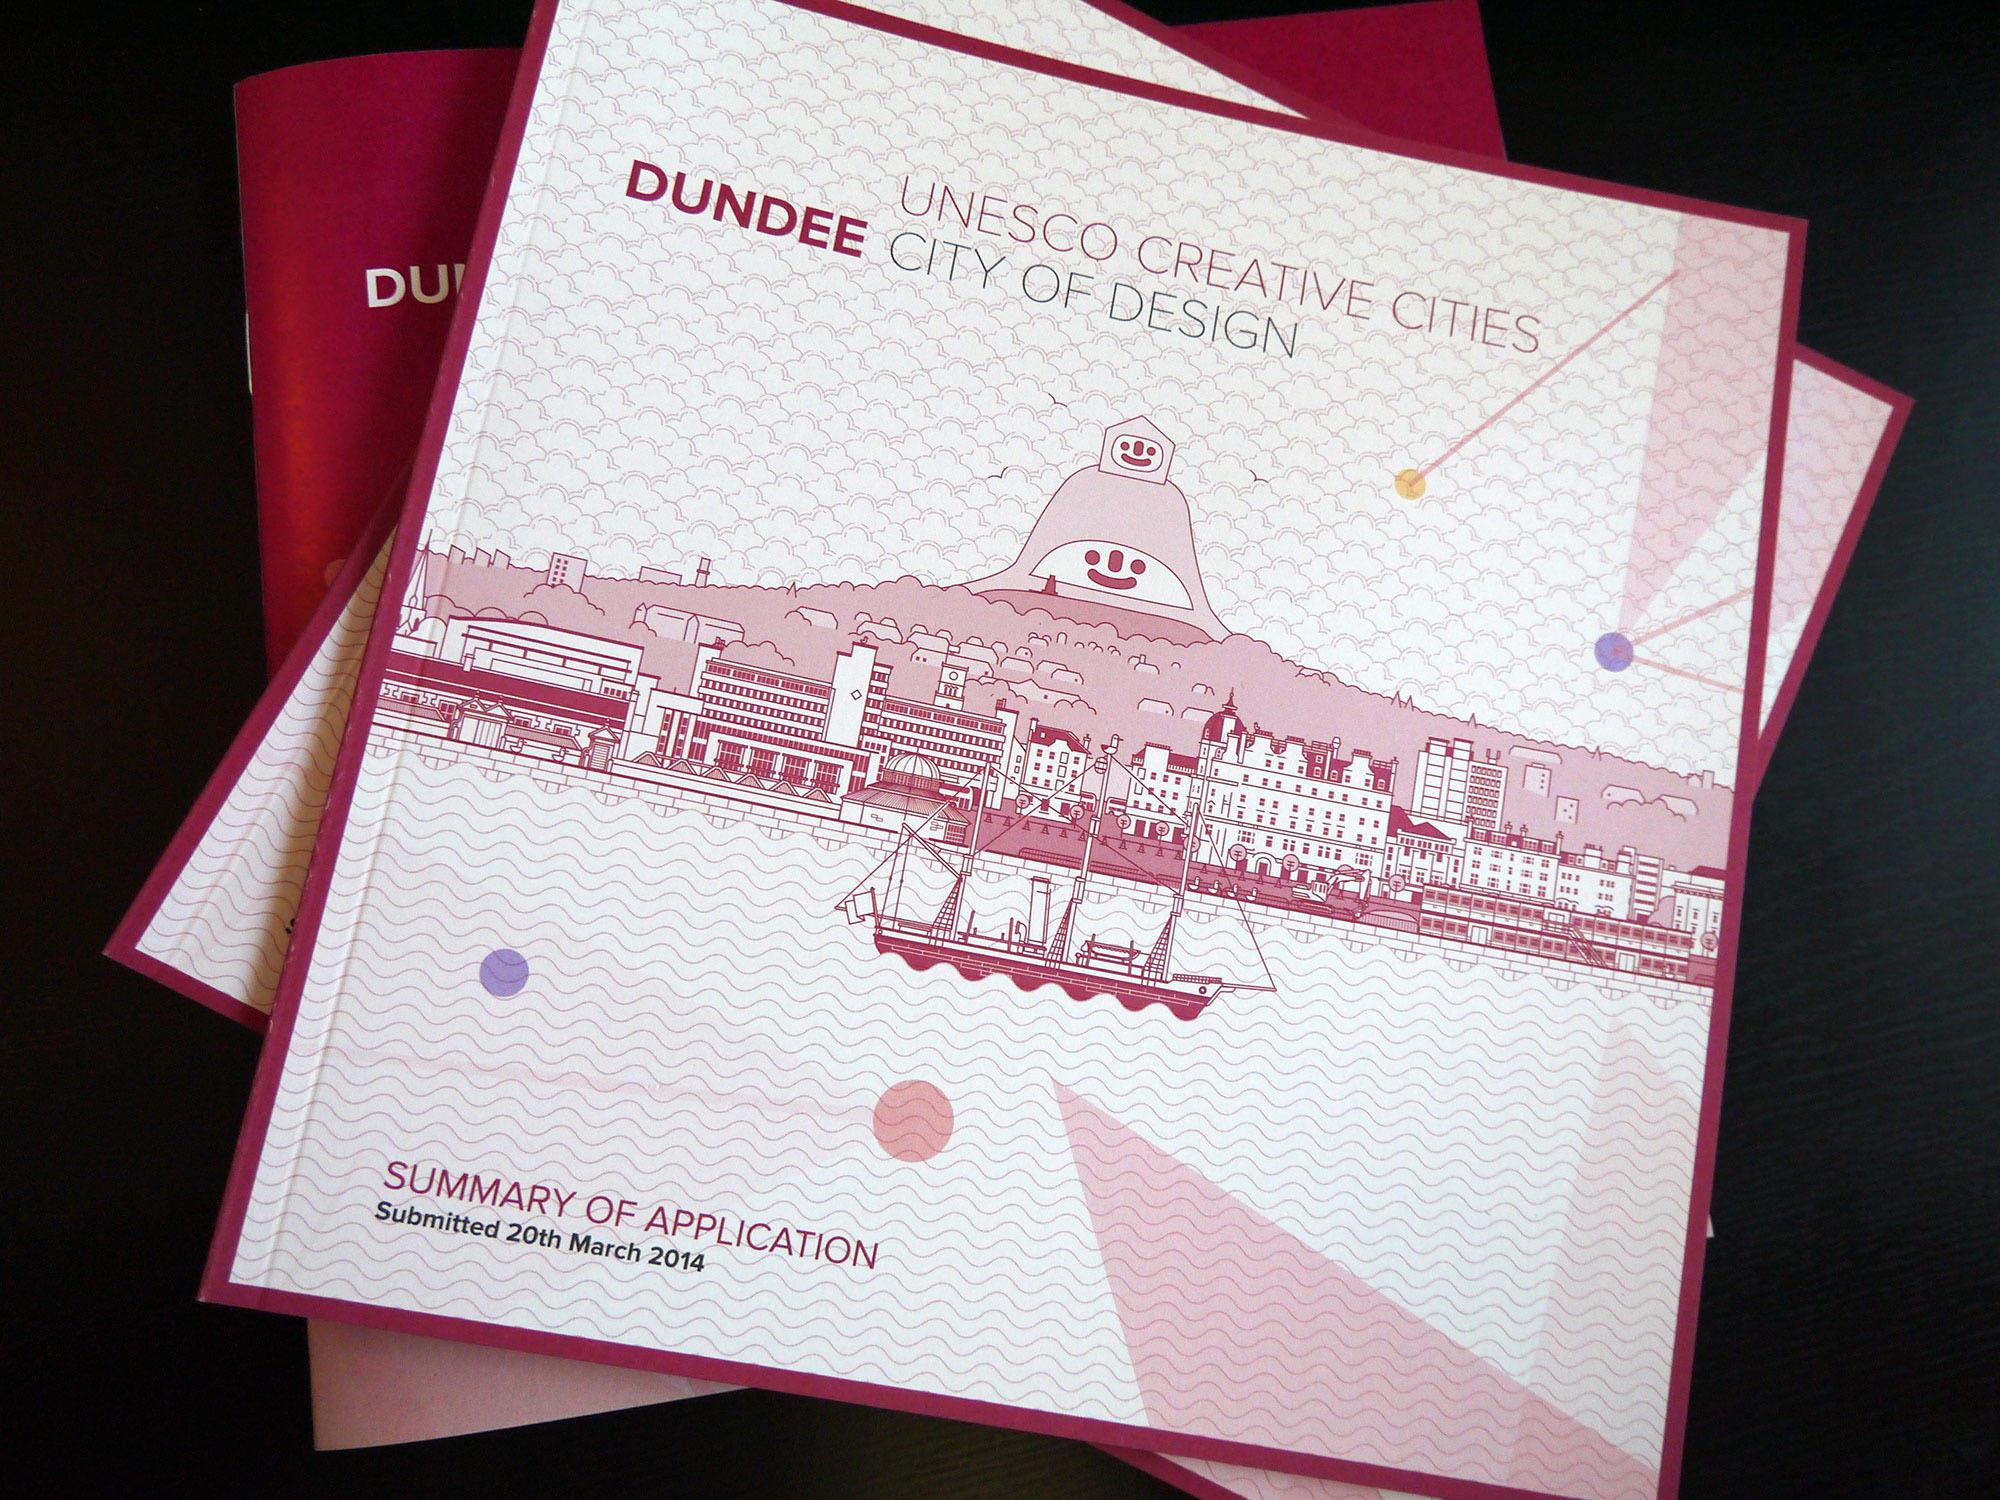 UNESCO City of Design Illustration on documents